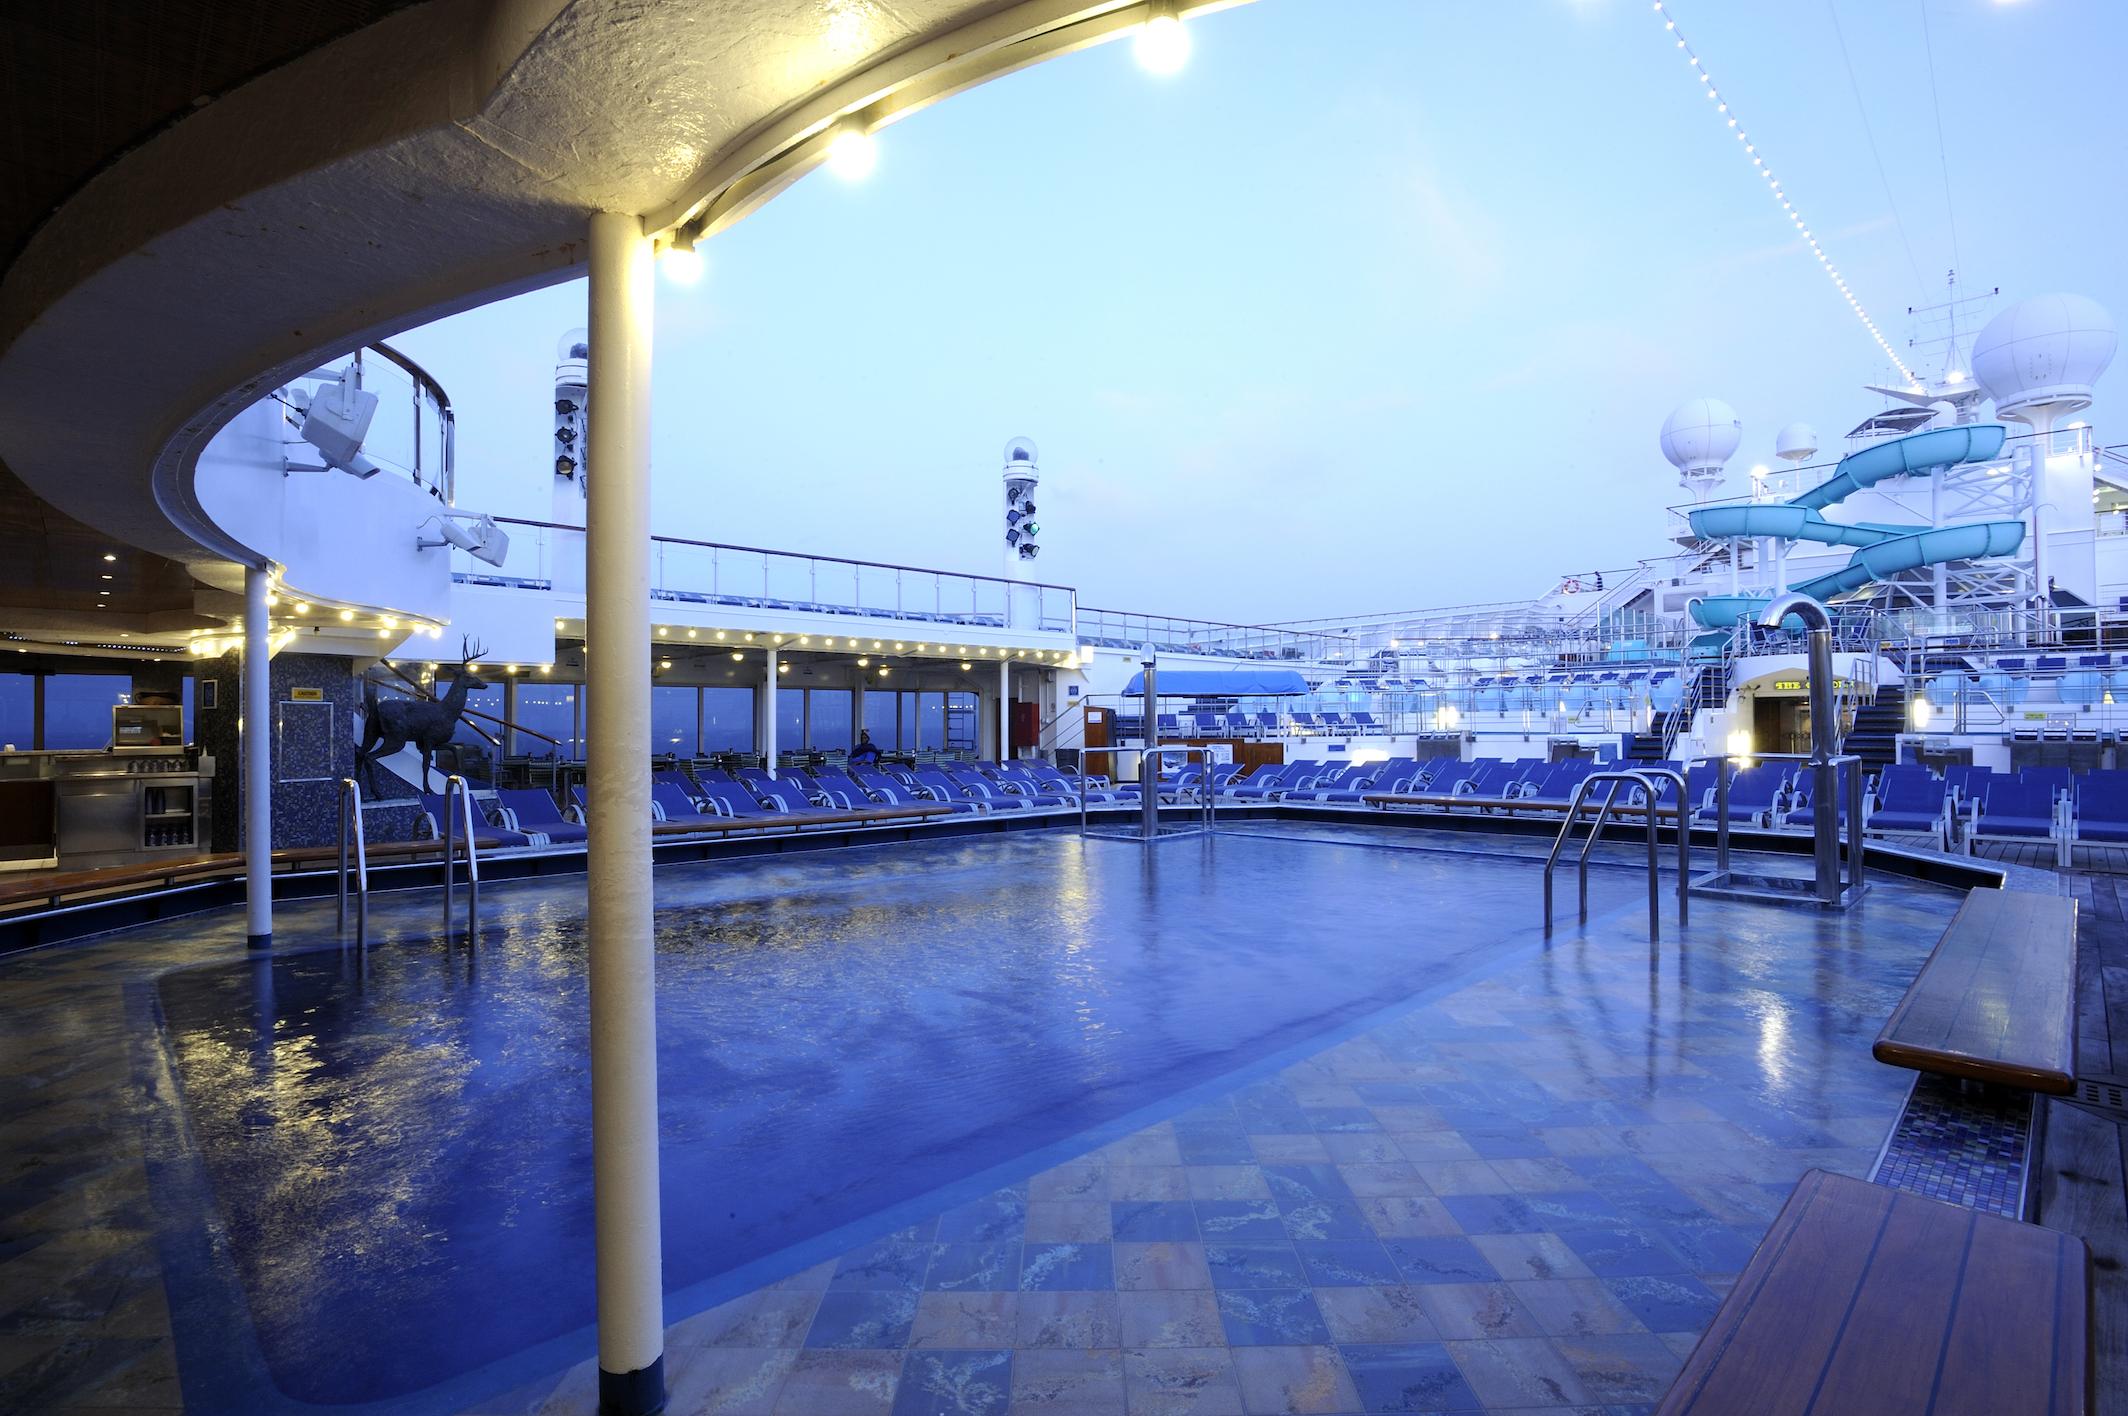 Carnival Liberty Tivoli Pool 7.jpg